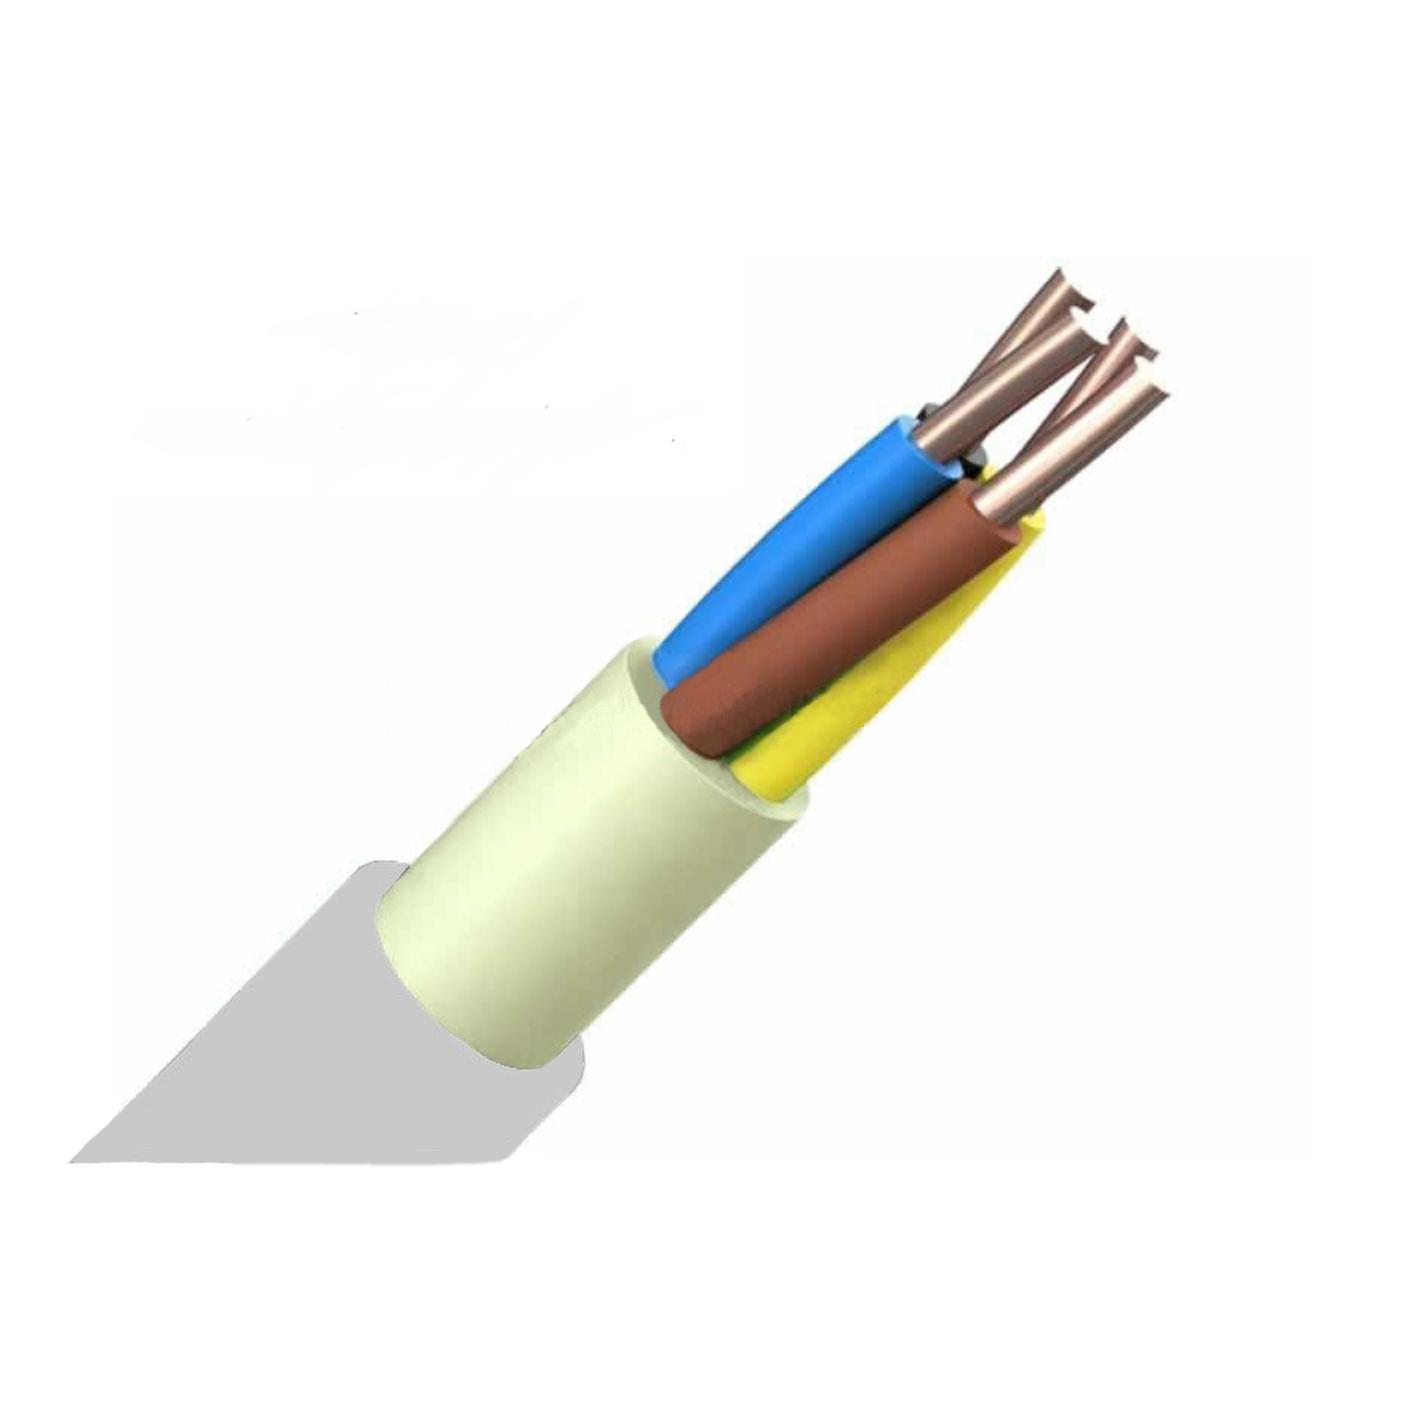 Öznur 4x6 NYM (NVV) Kablo